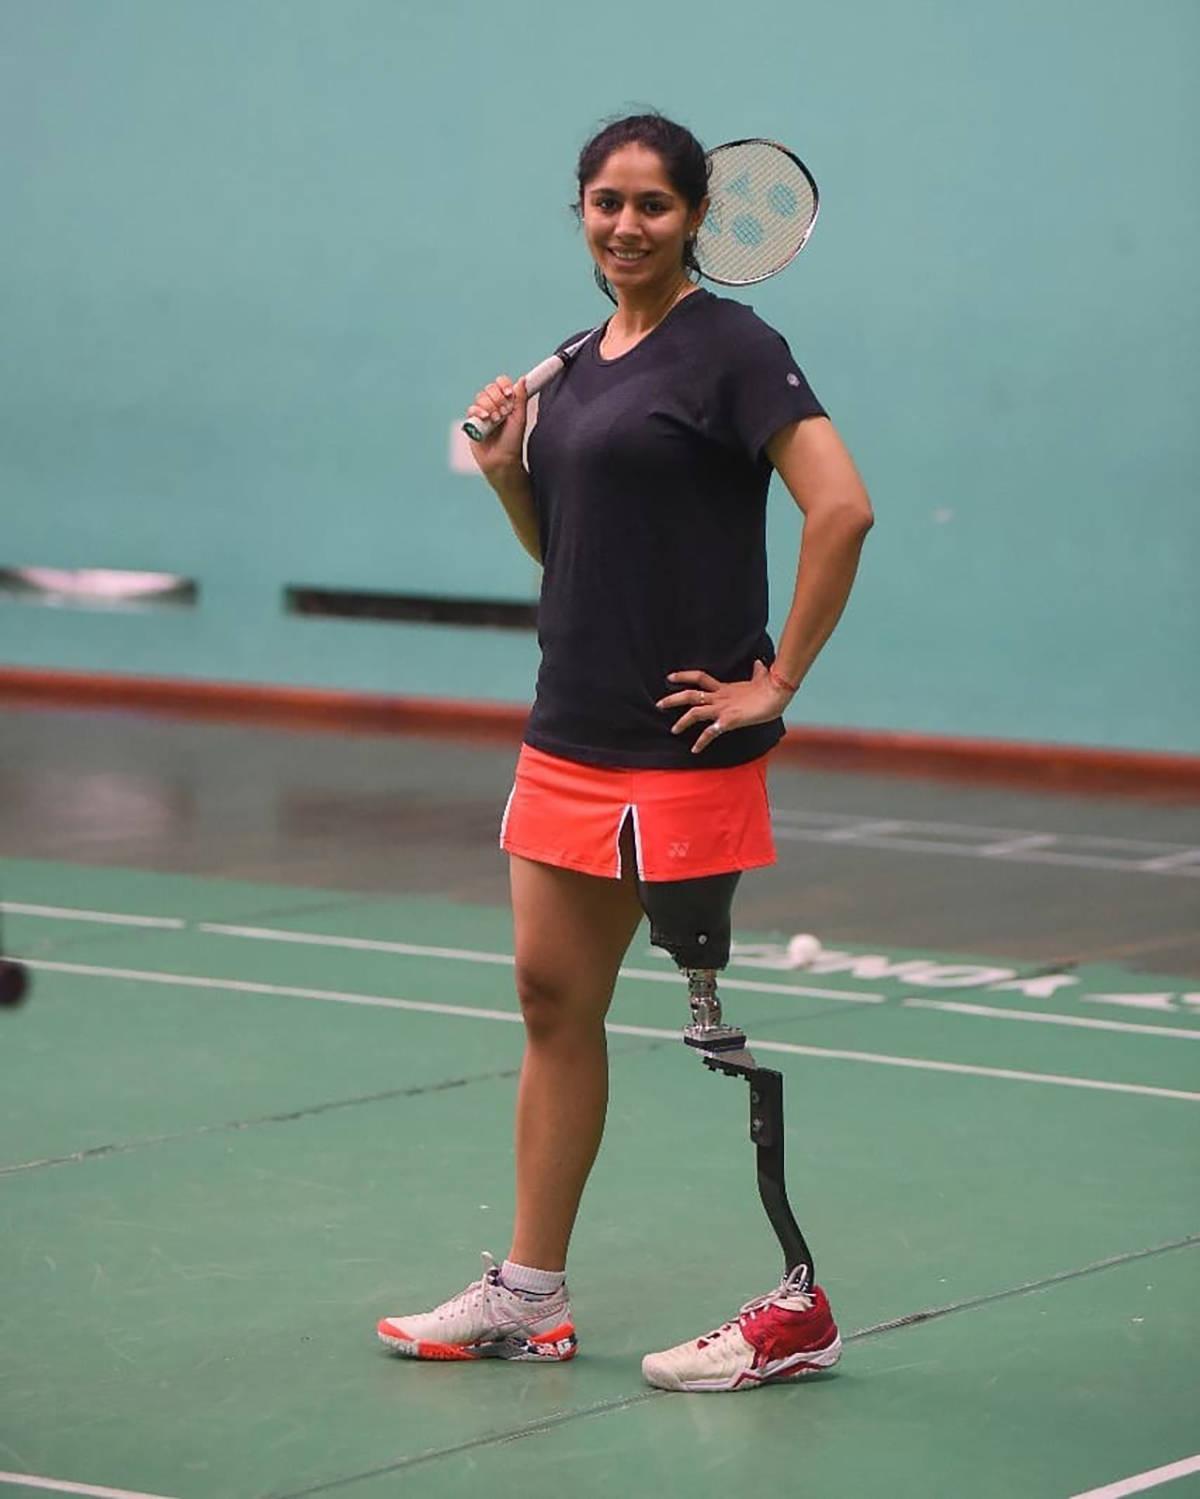 Para-badminton athlete Manasi Joshi is an unstoppable force inspiring millions